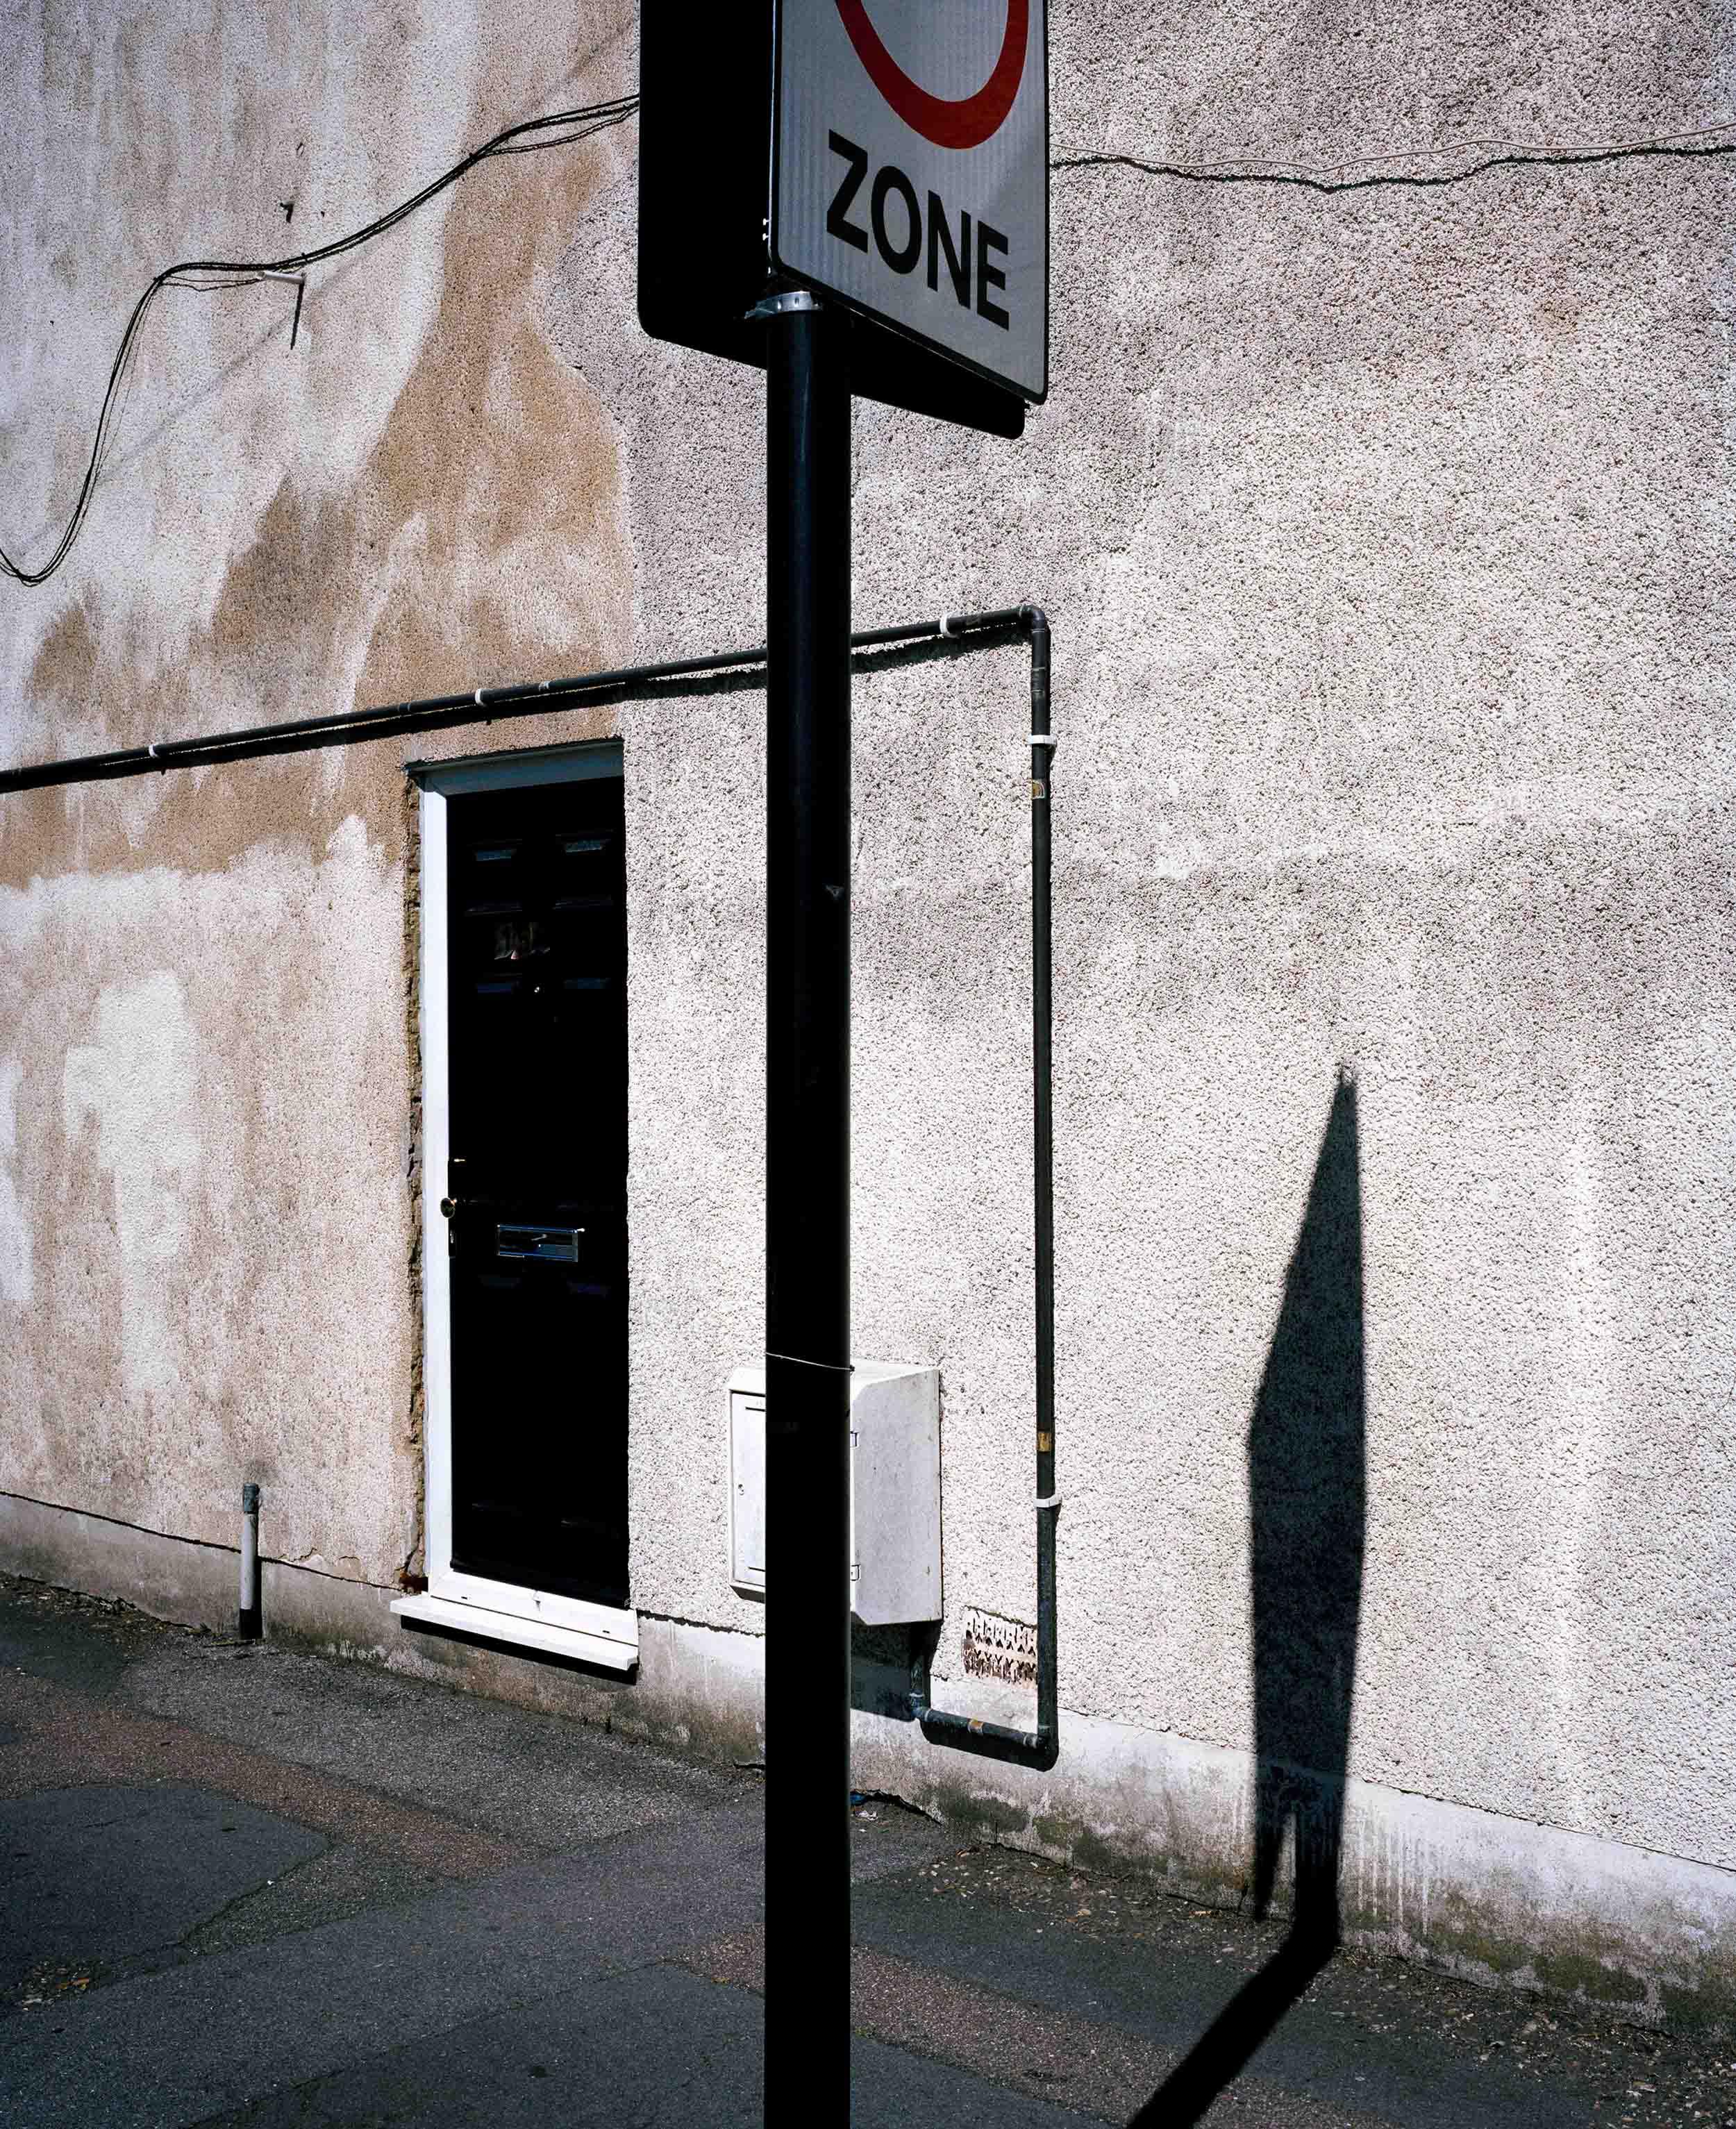 4-blighty-england-london-sam-gregg-photography.jpg